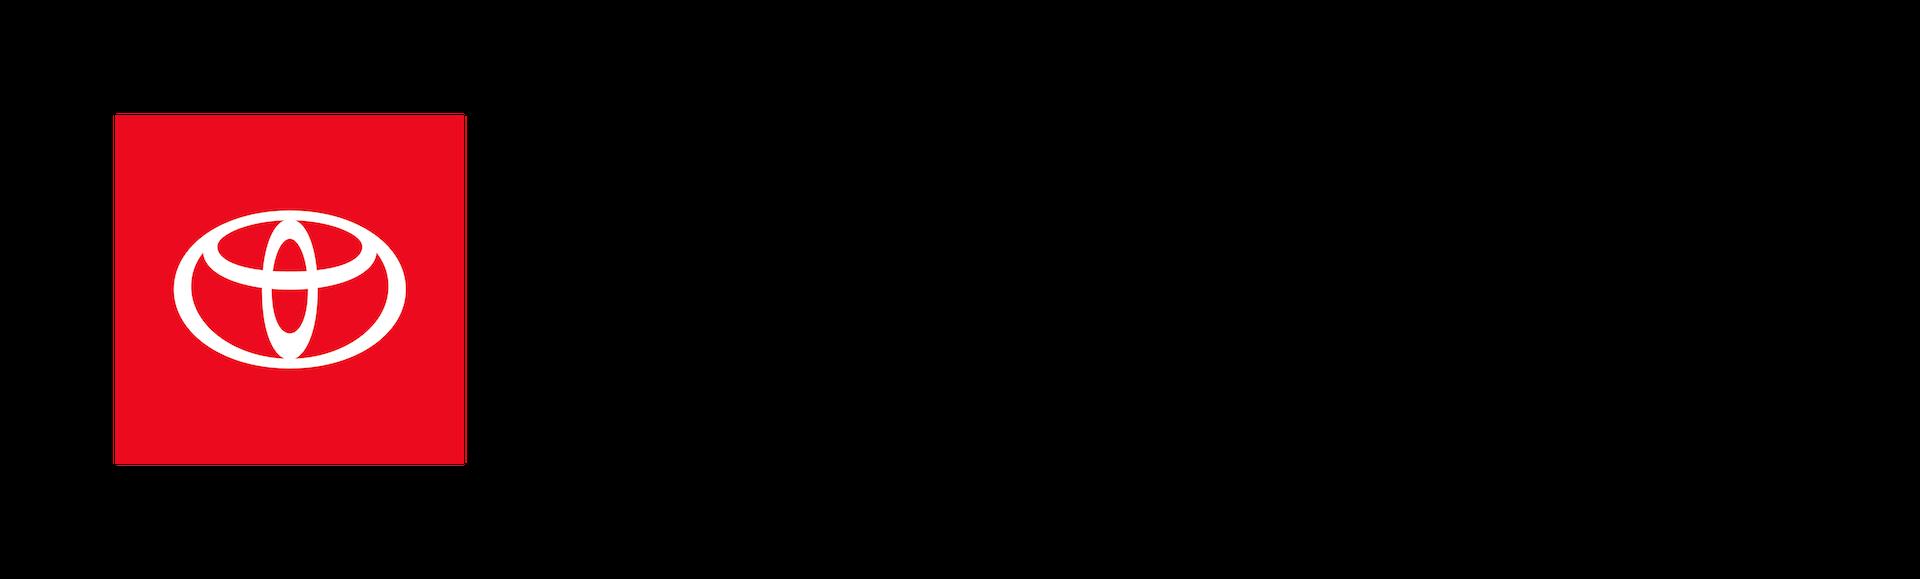 toyota_rent_a_toyota_logo